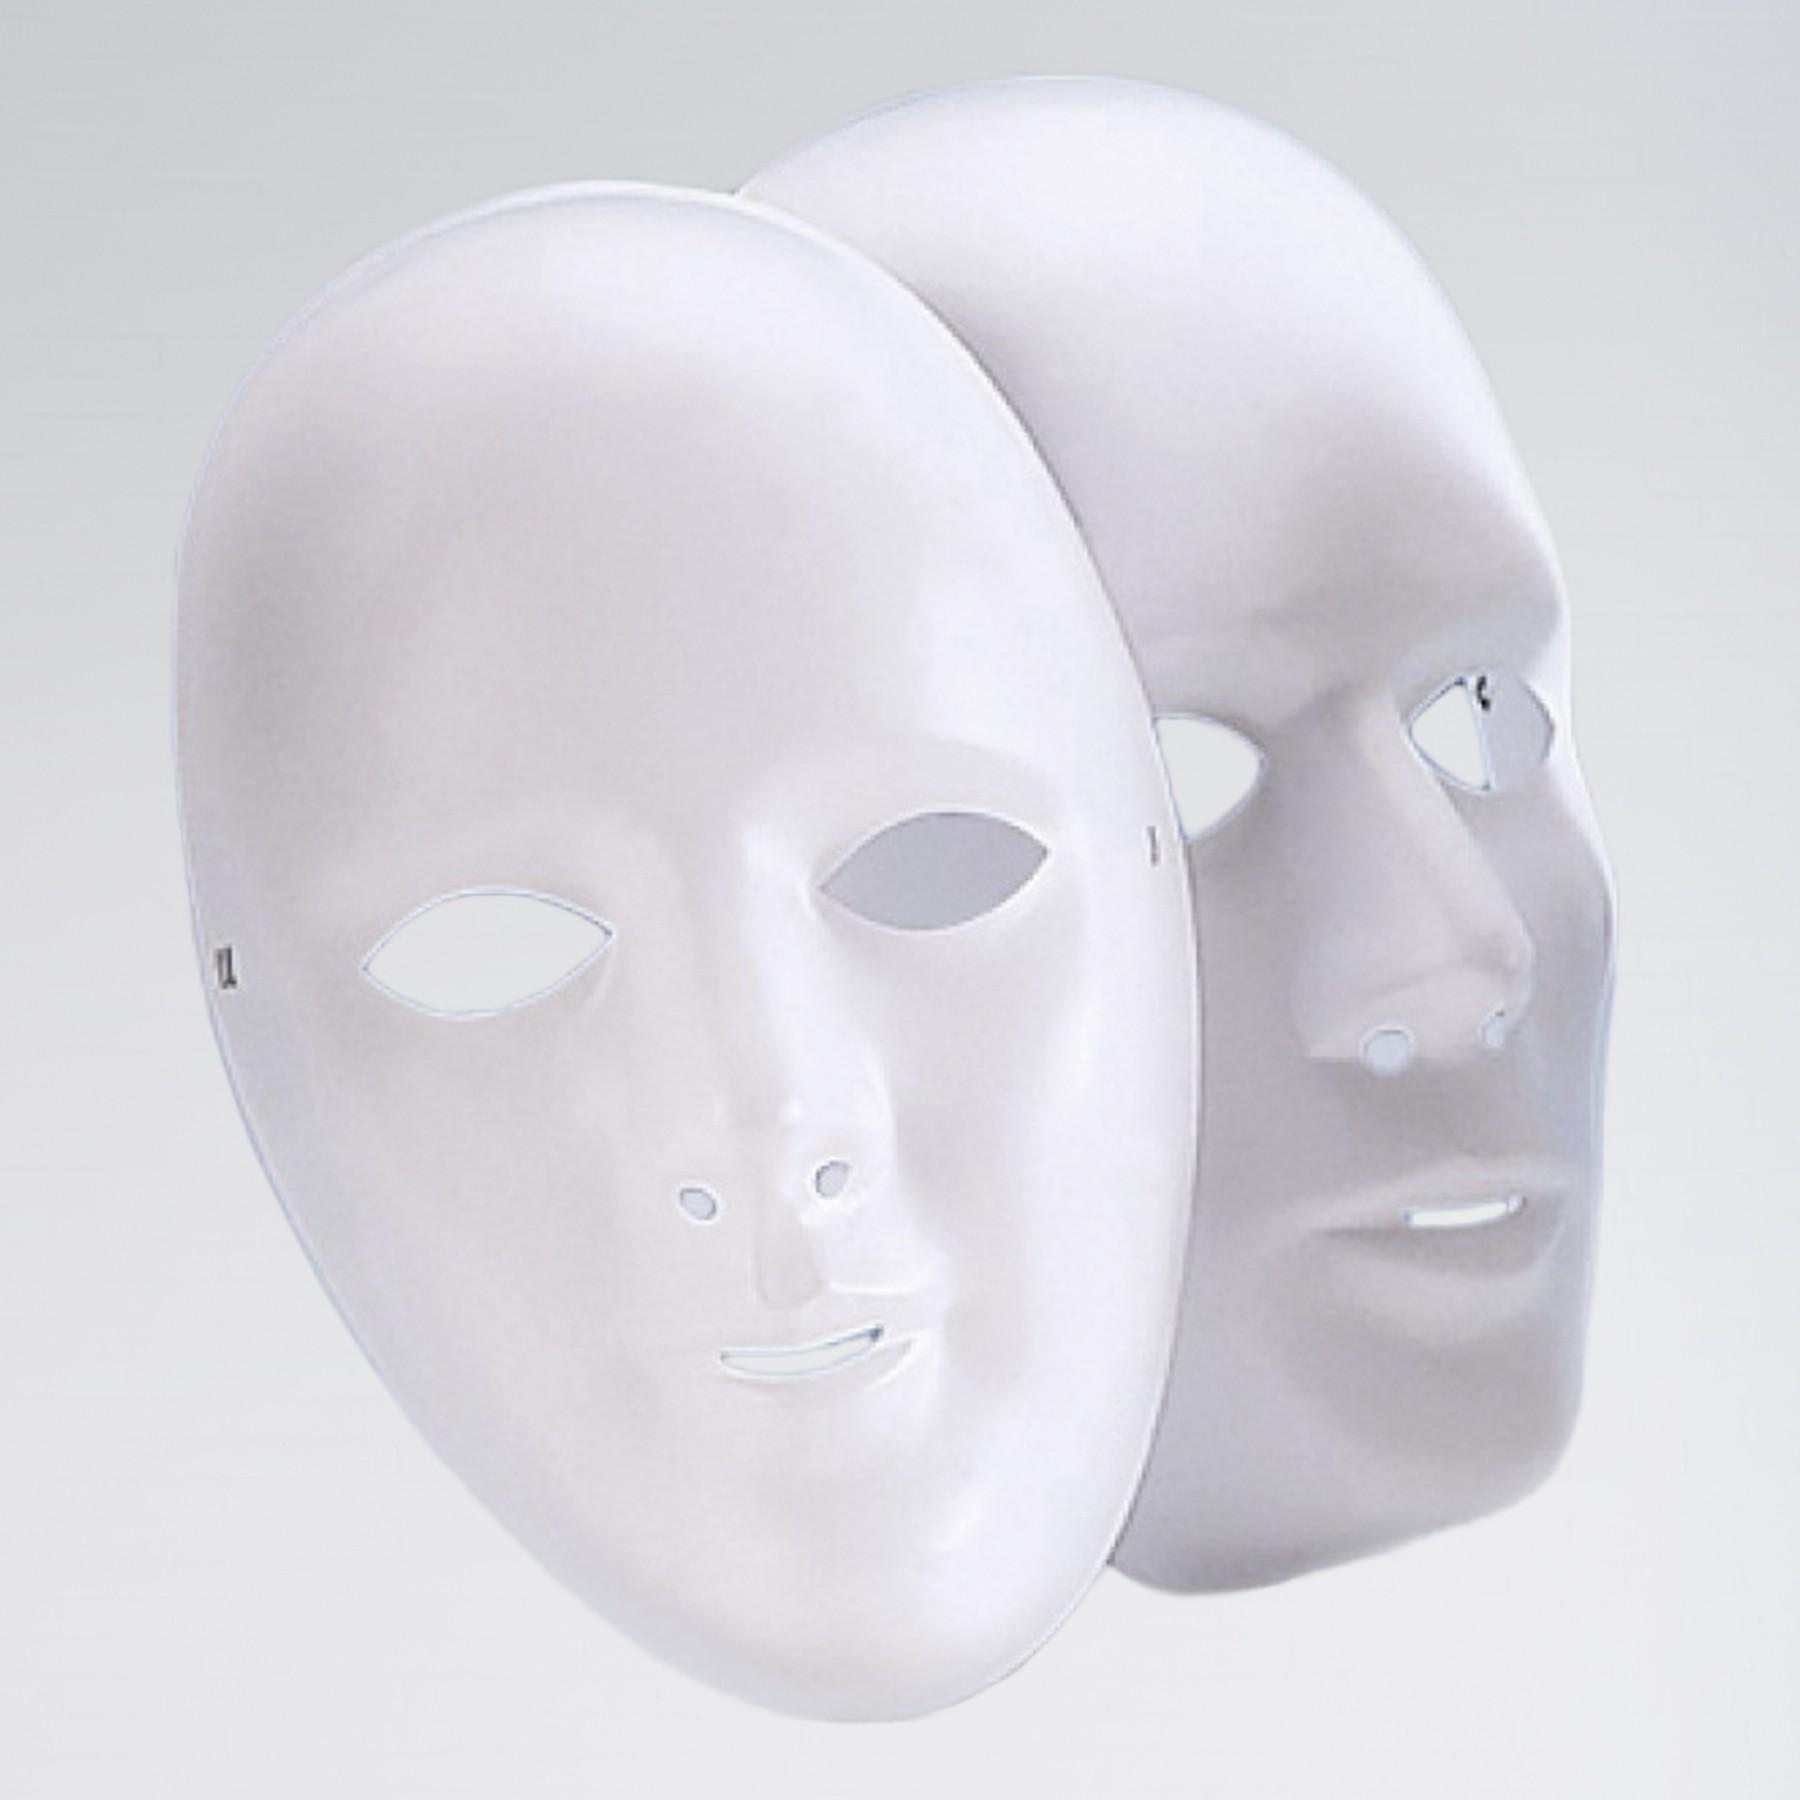 Face Mask - Female (White)